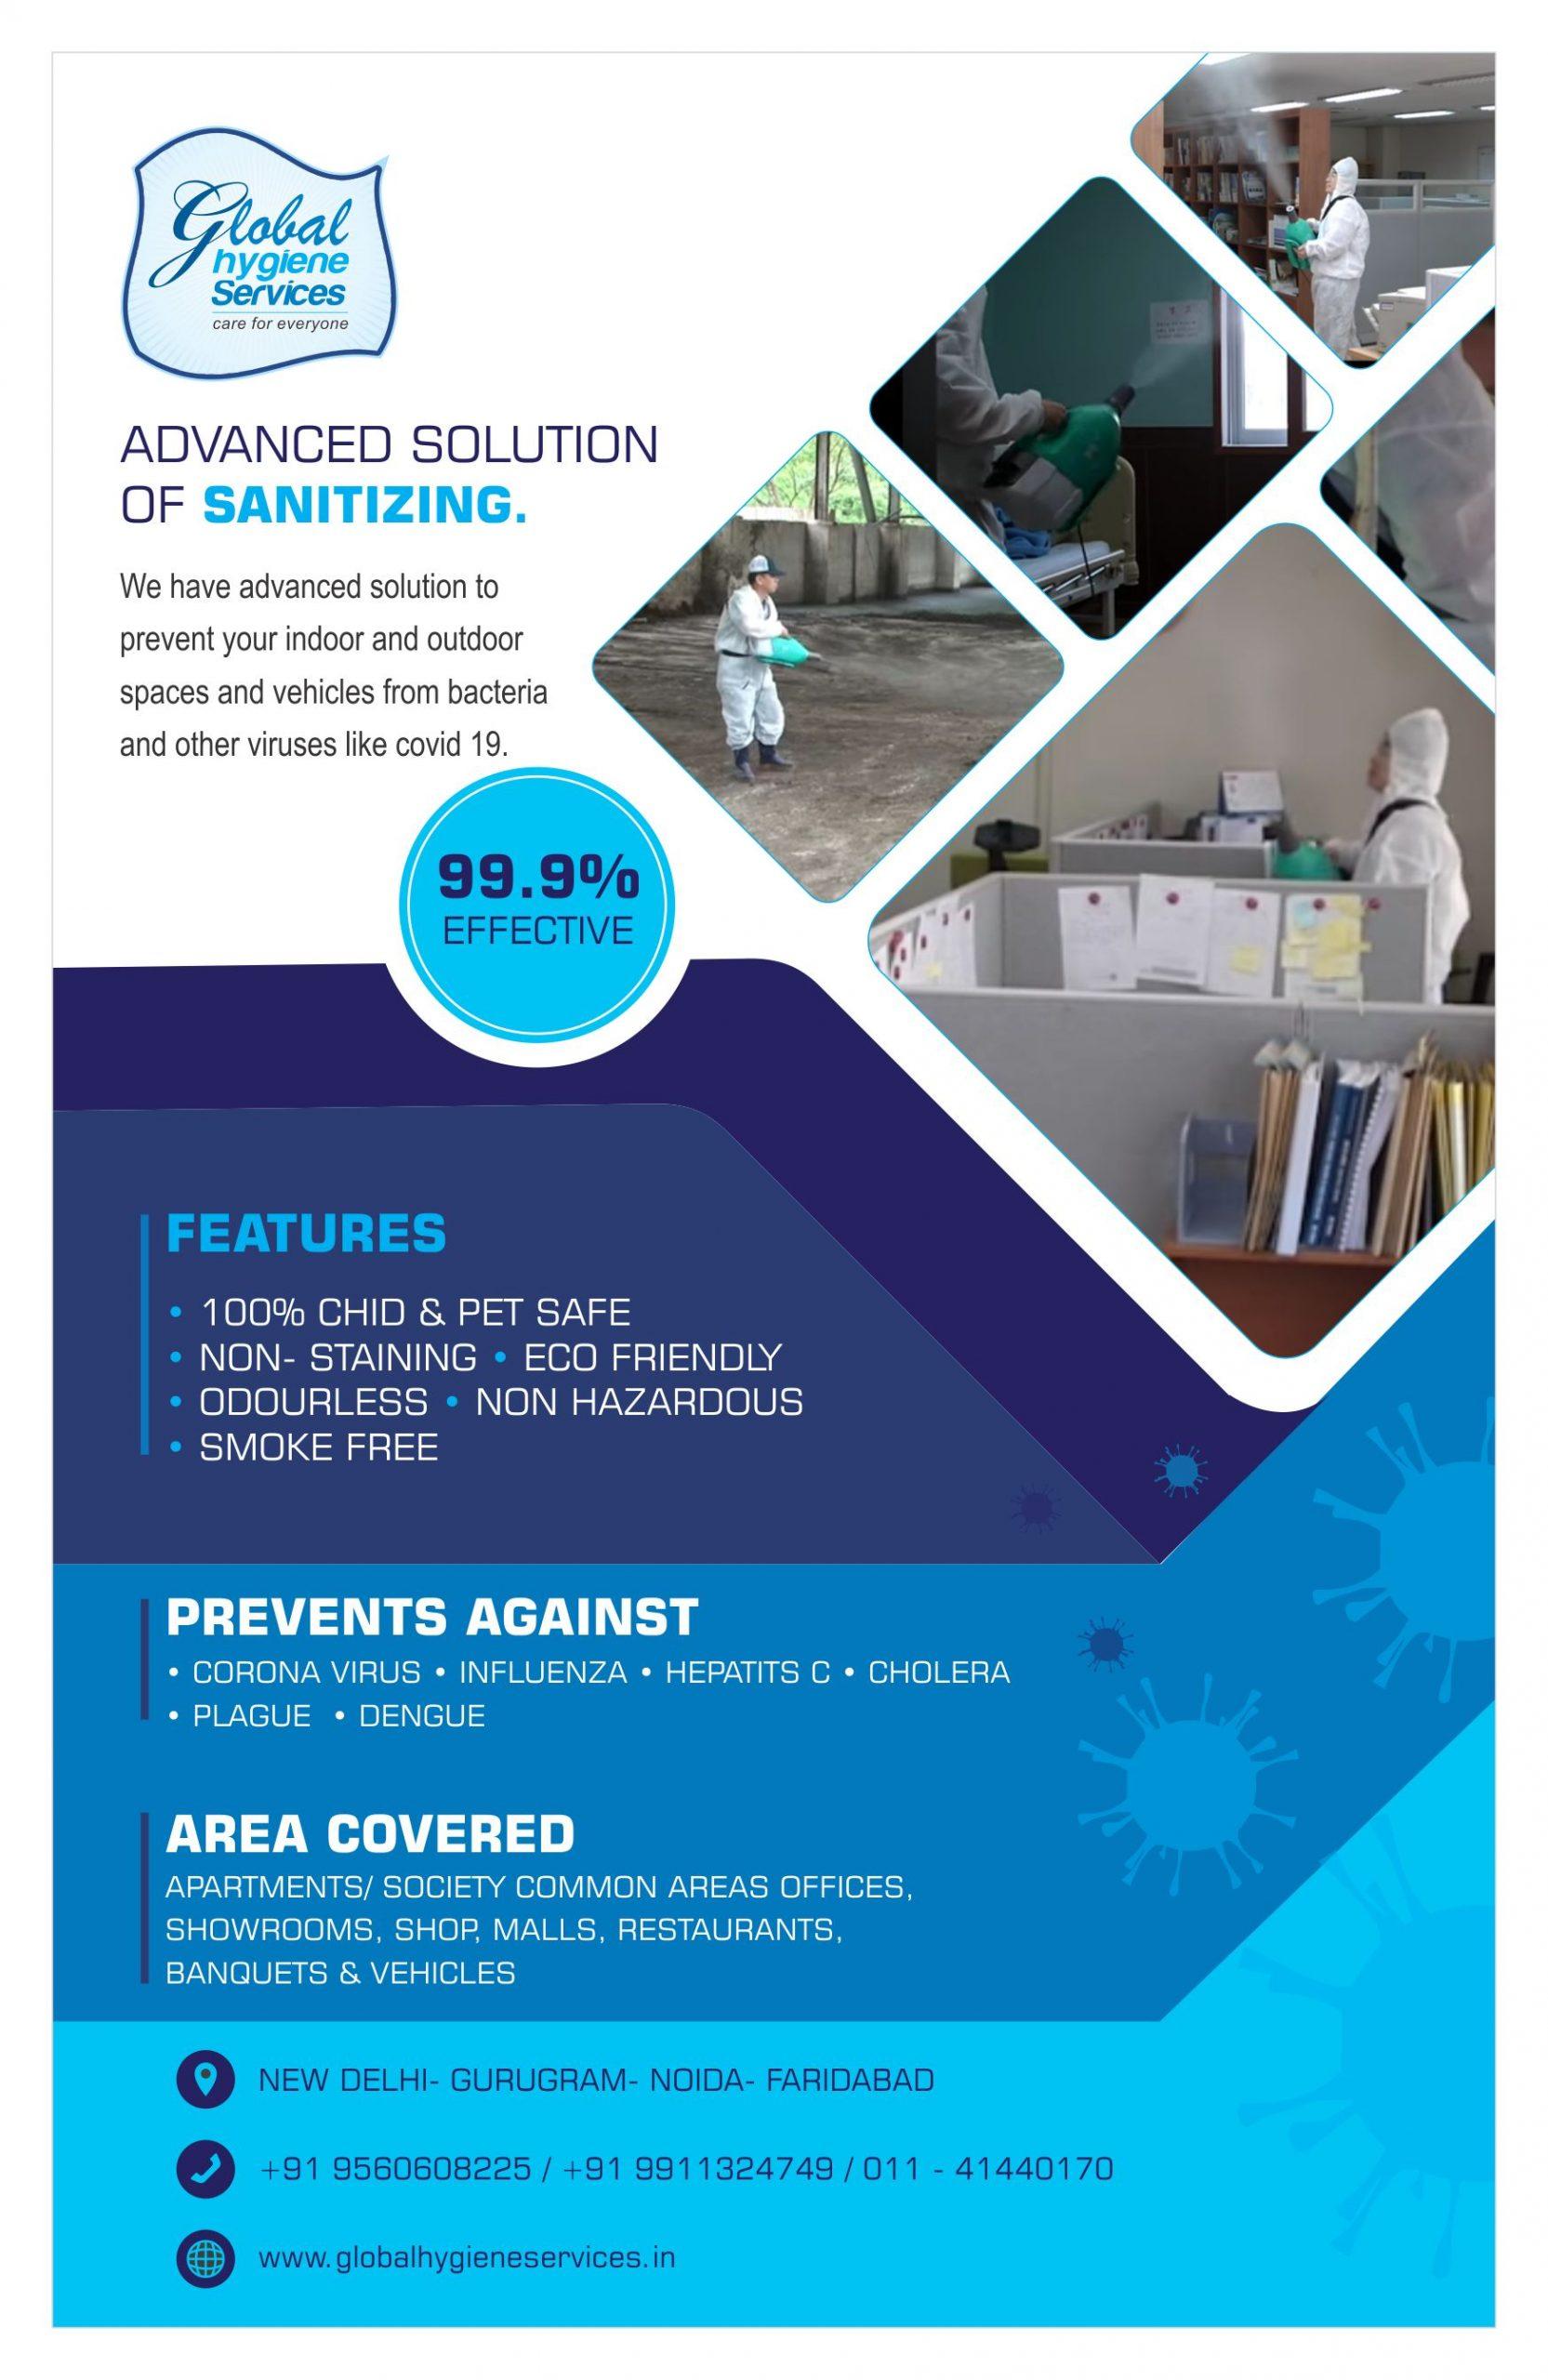 Global Hygiene Services